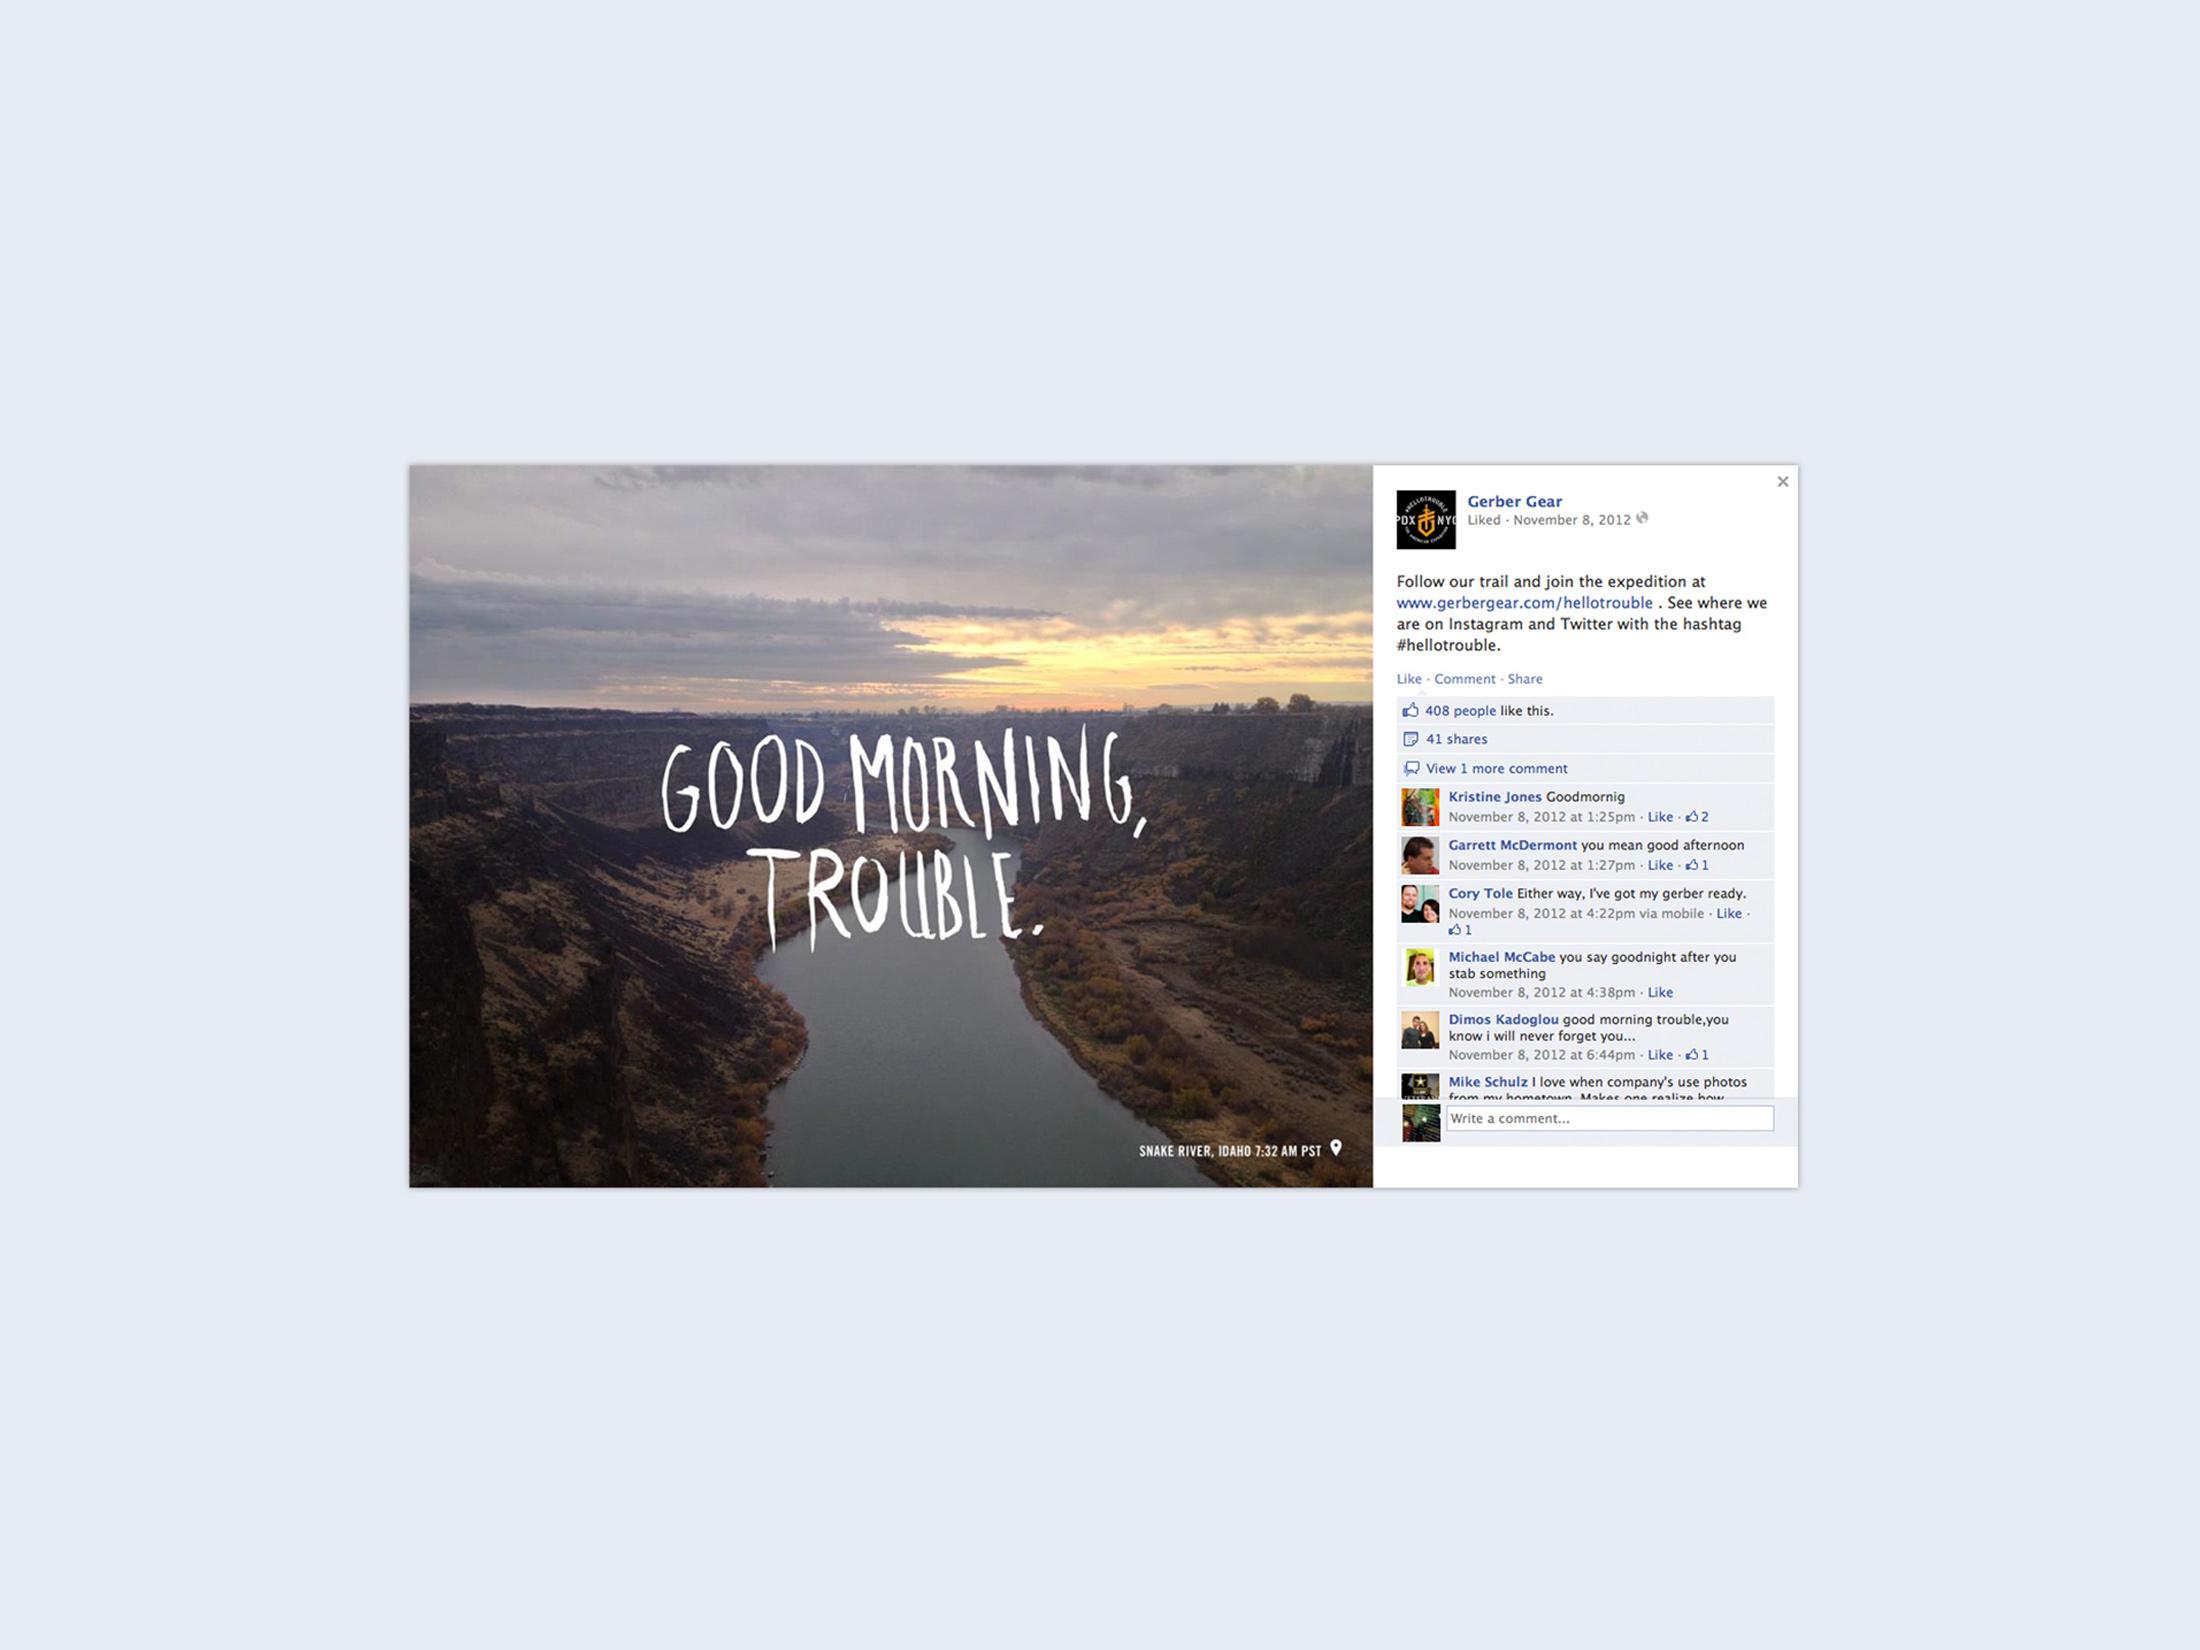 Gerber 2013 Facebook